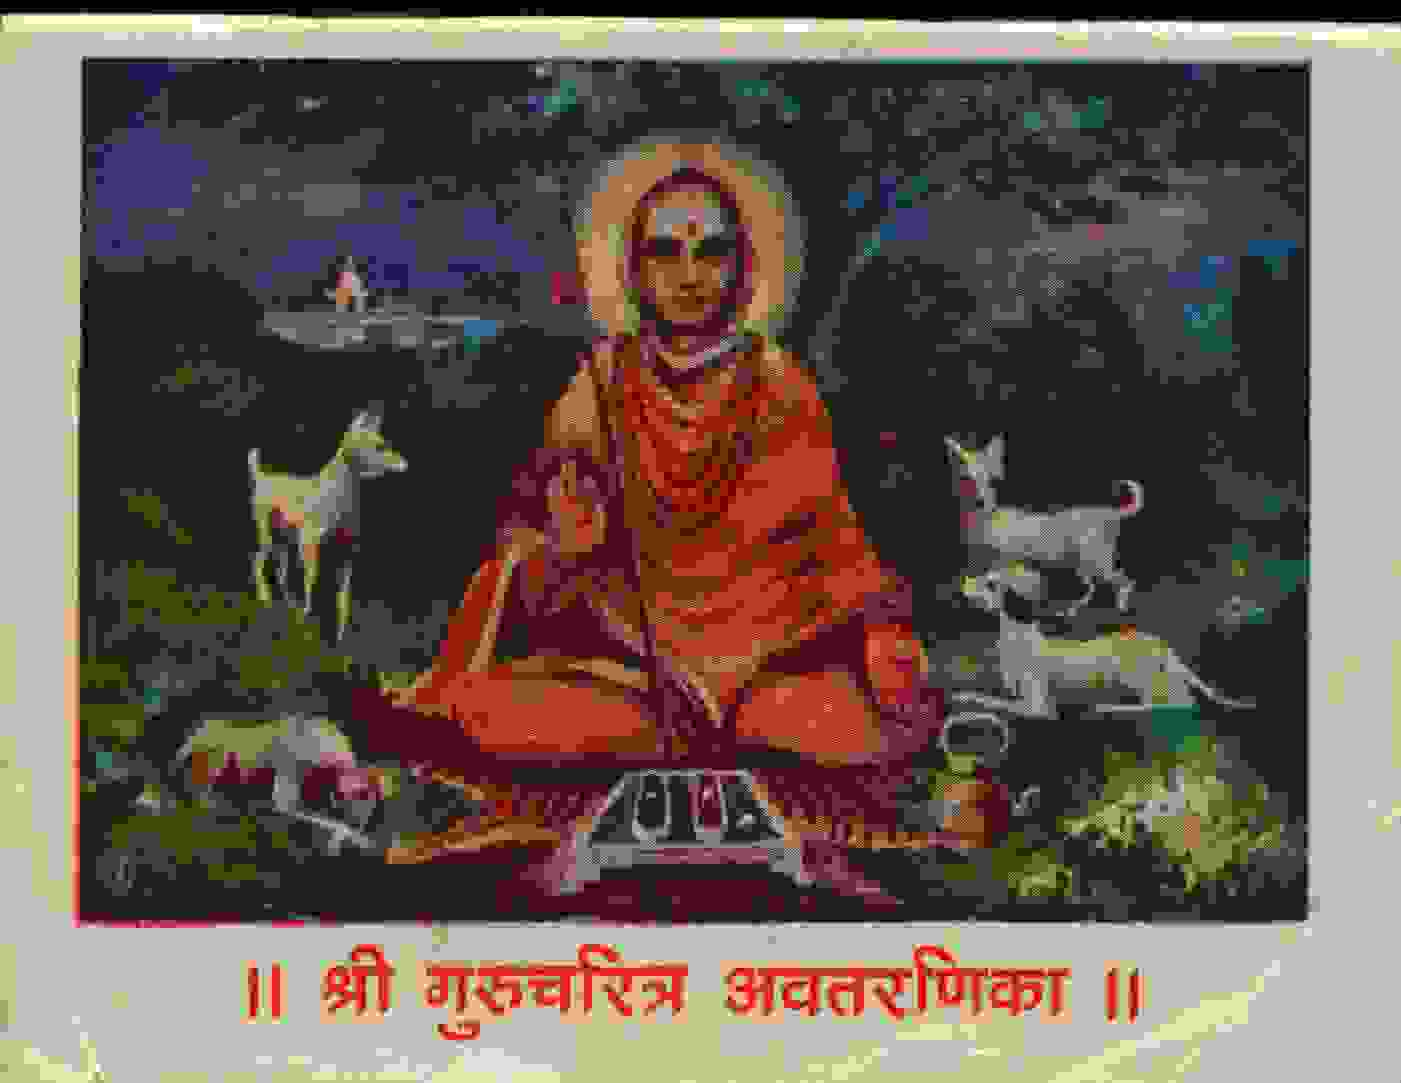 Gurucharitra in marathi 51. 0 free download.